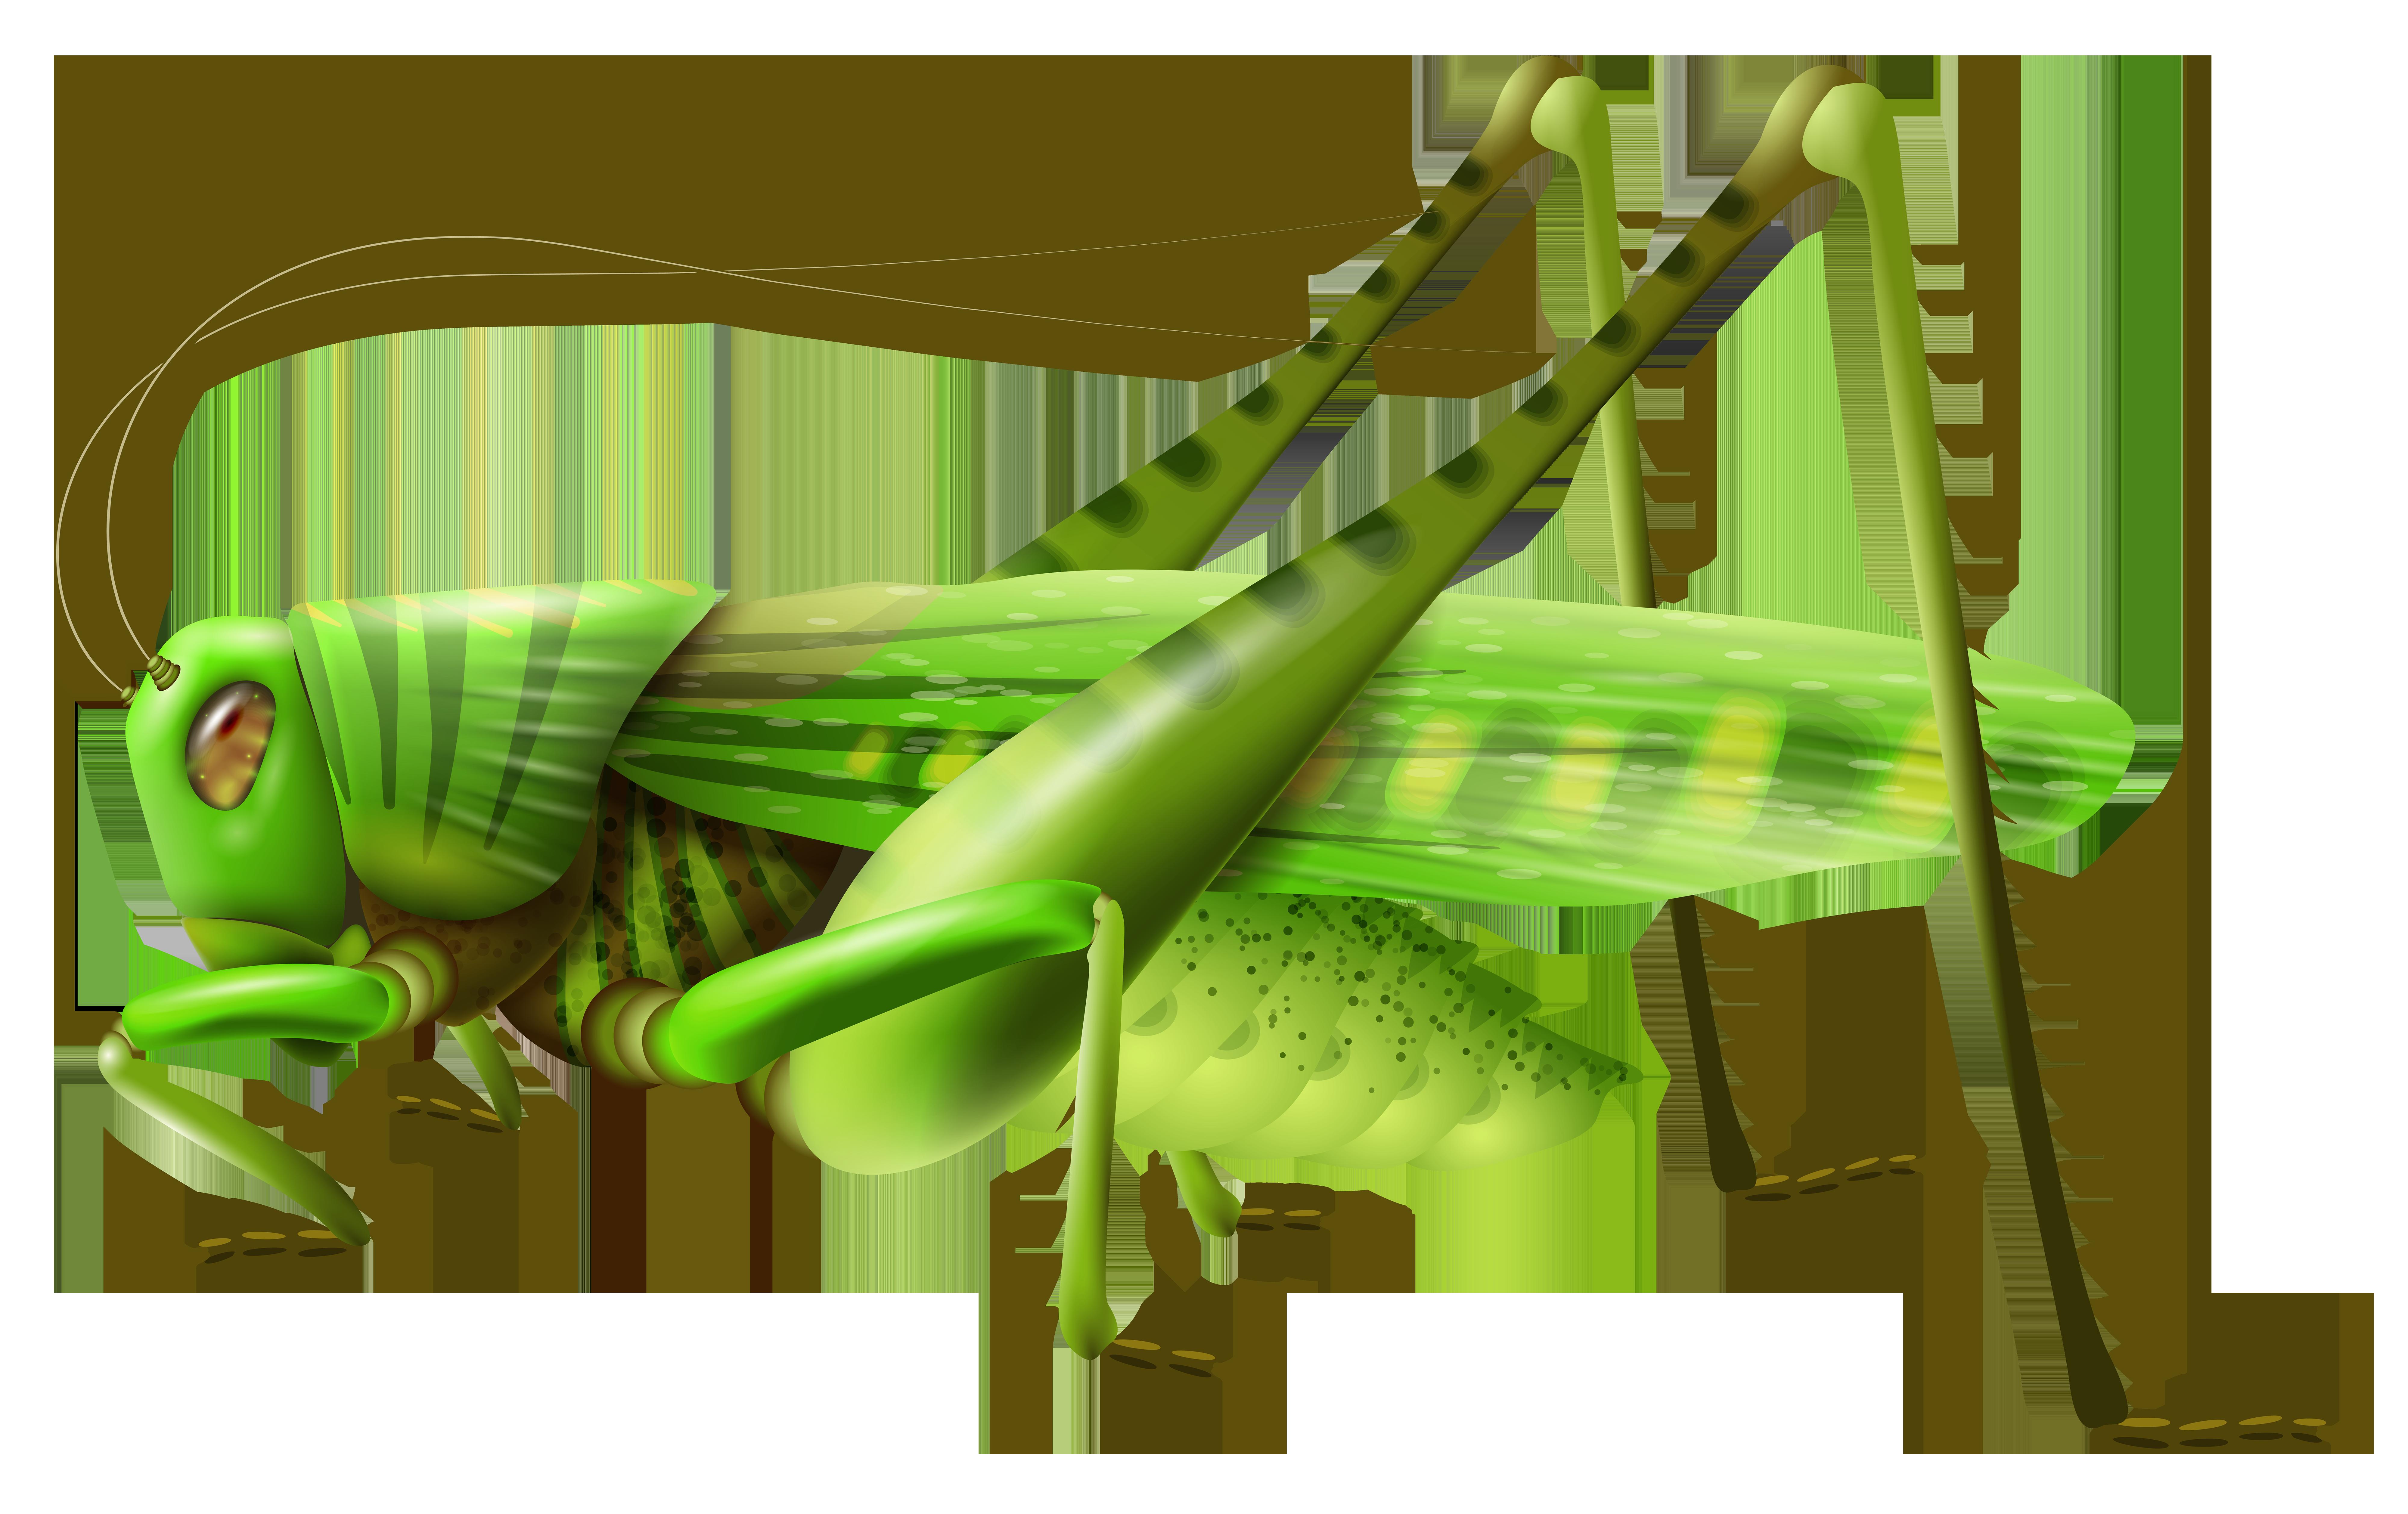 8000x5031 Top 77 Grasshopper Clip Art